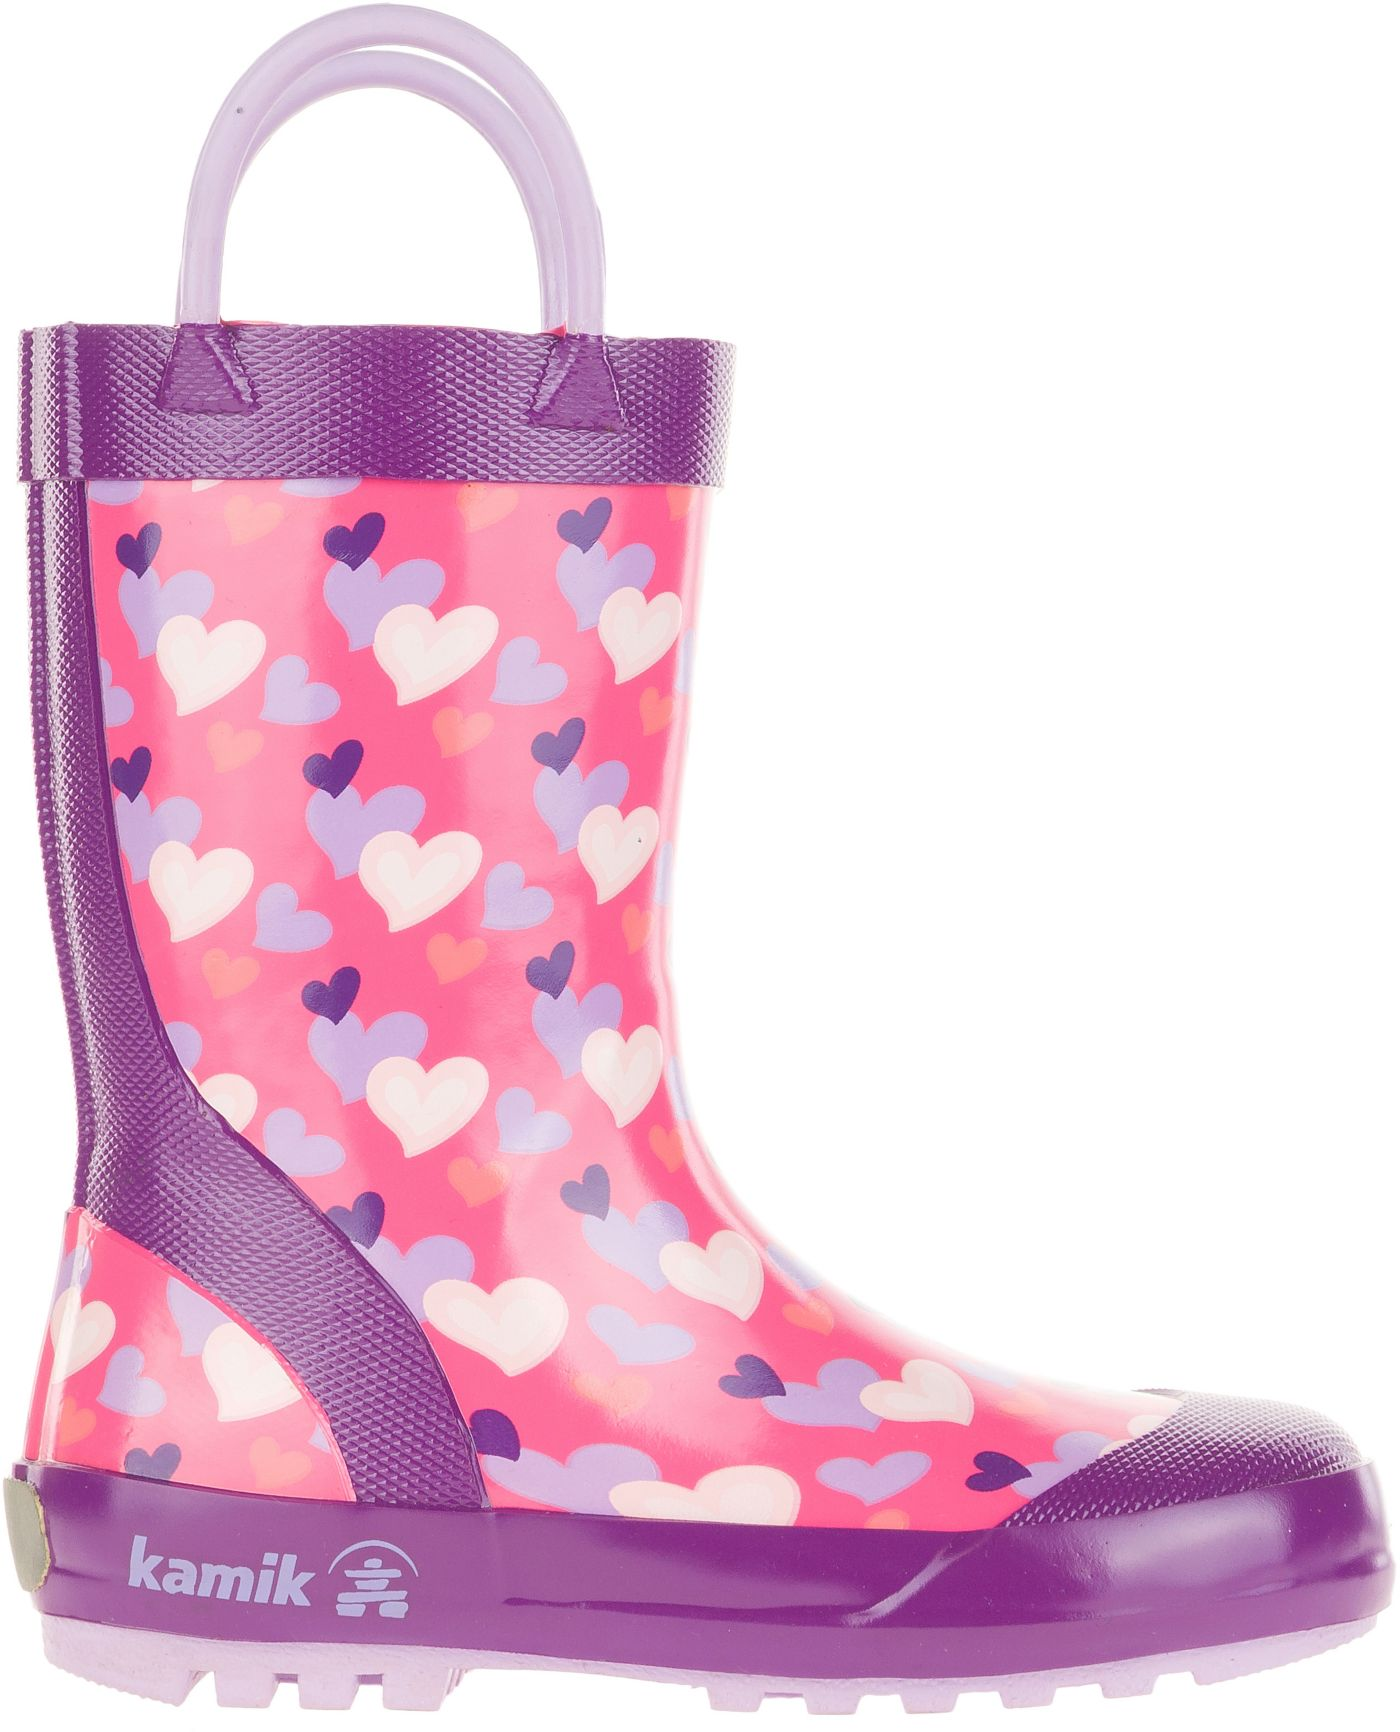 Kamik Kids' Lovely Rain Boots